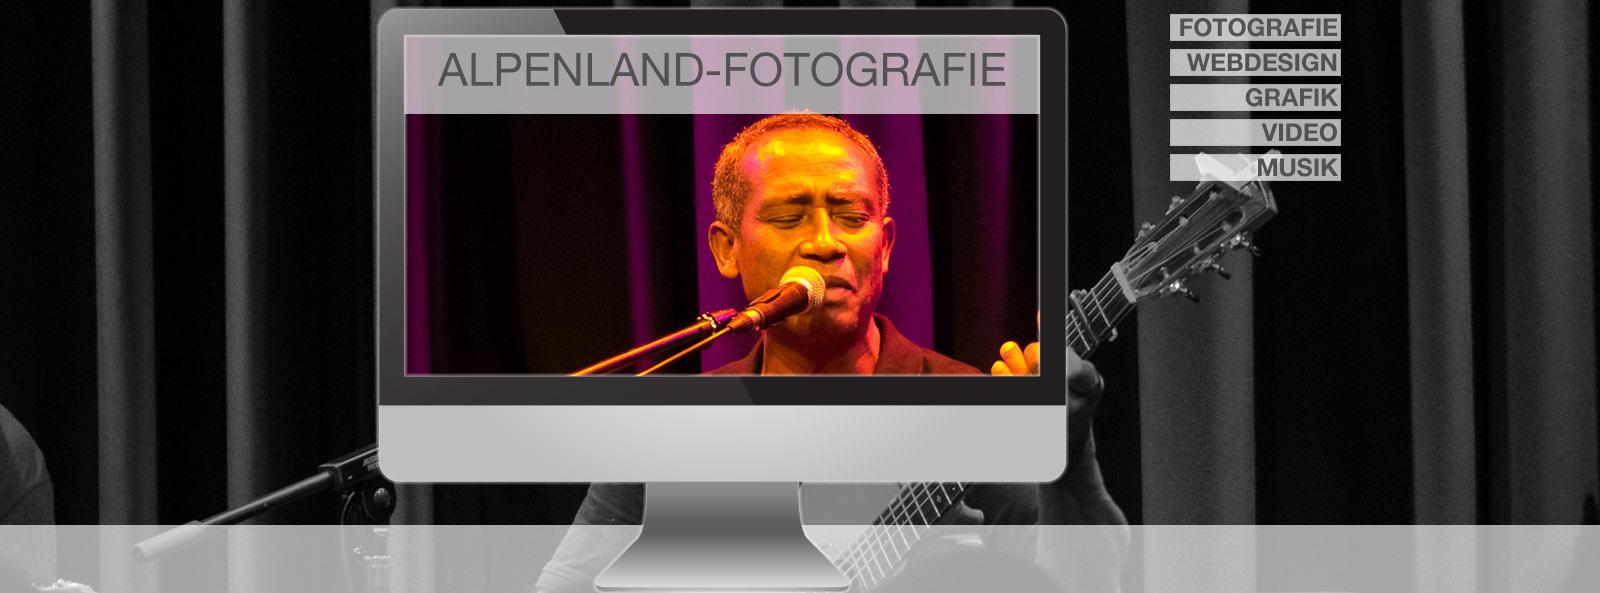 Konzertfotografie - Alpenland Fotografie